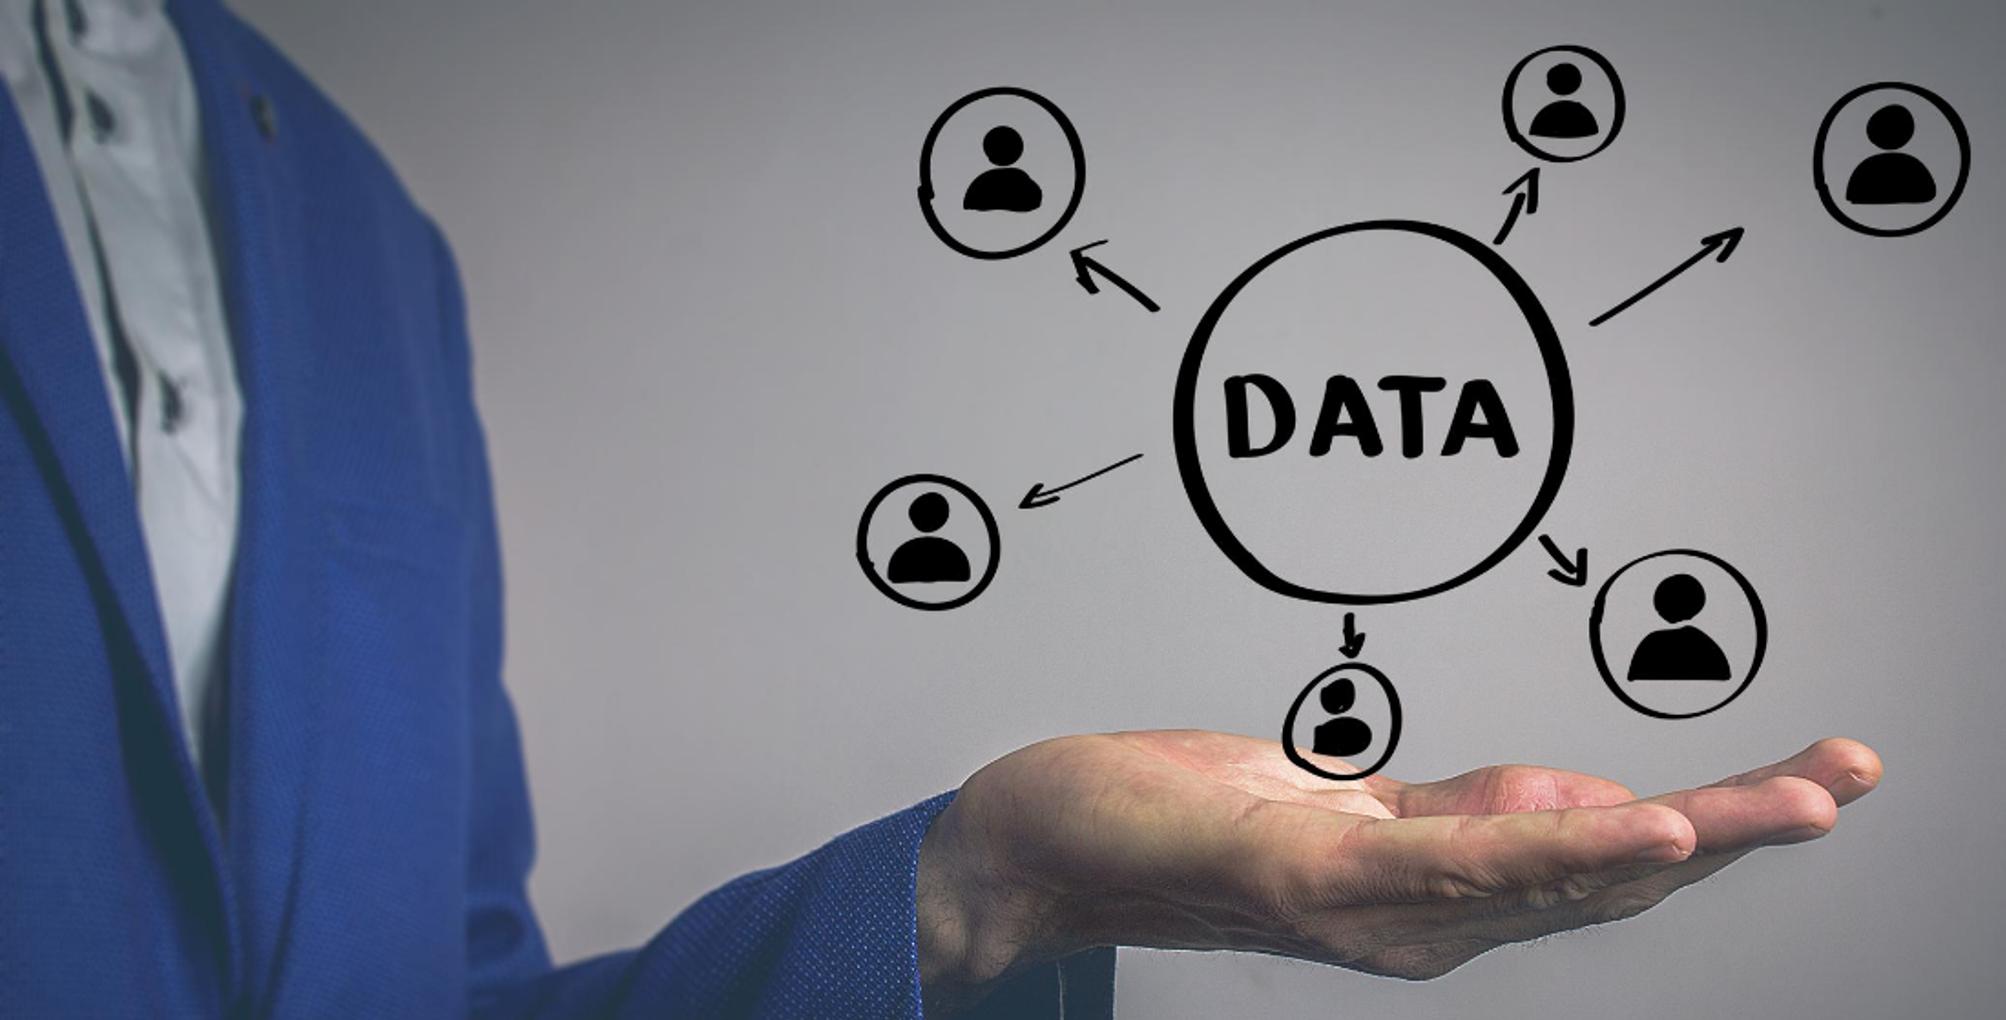 data back up